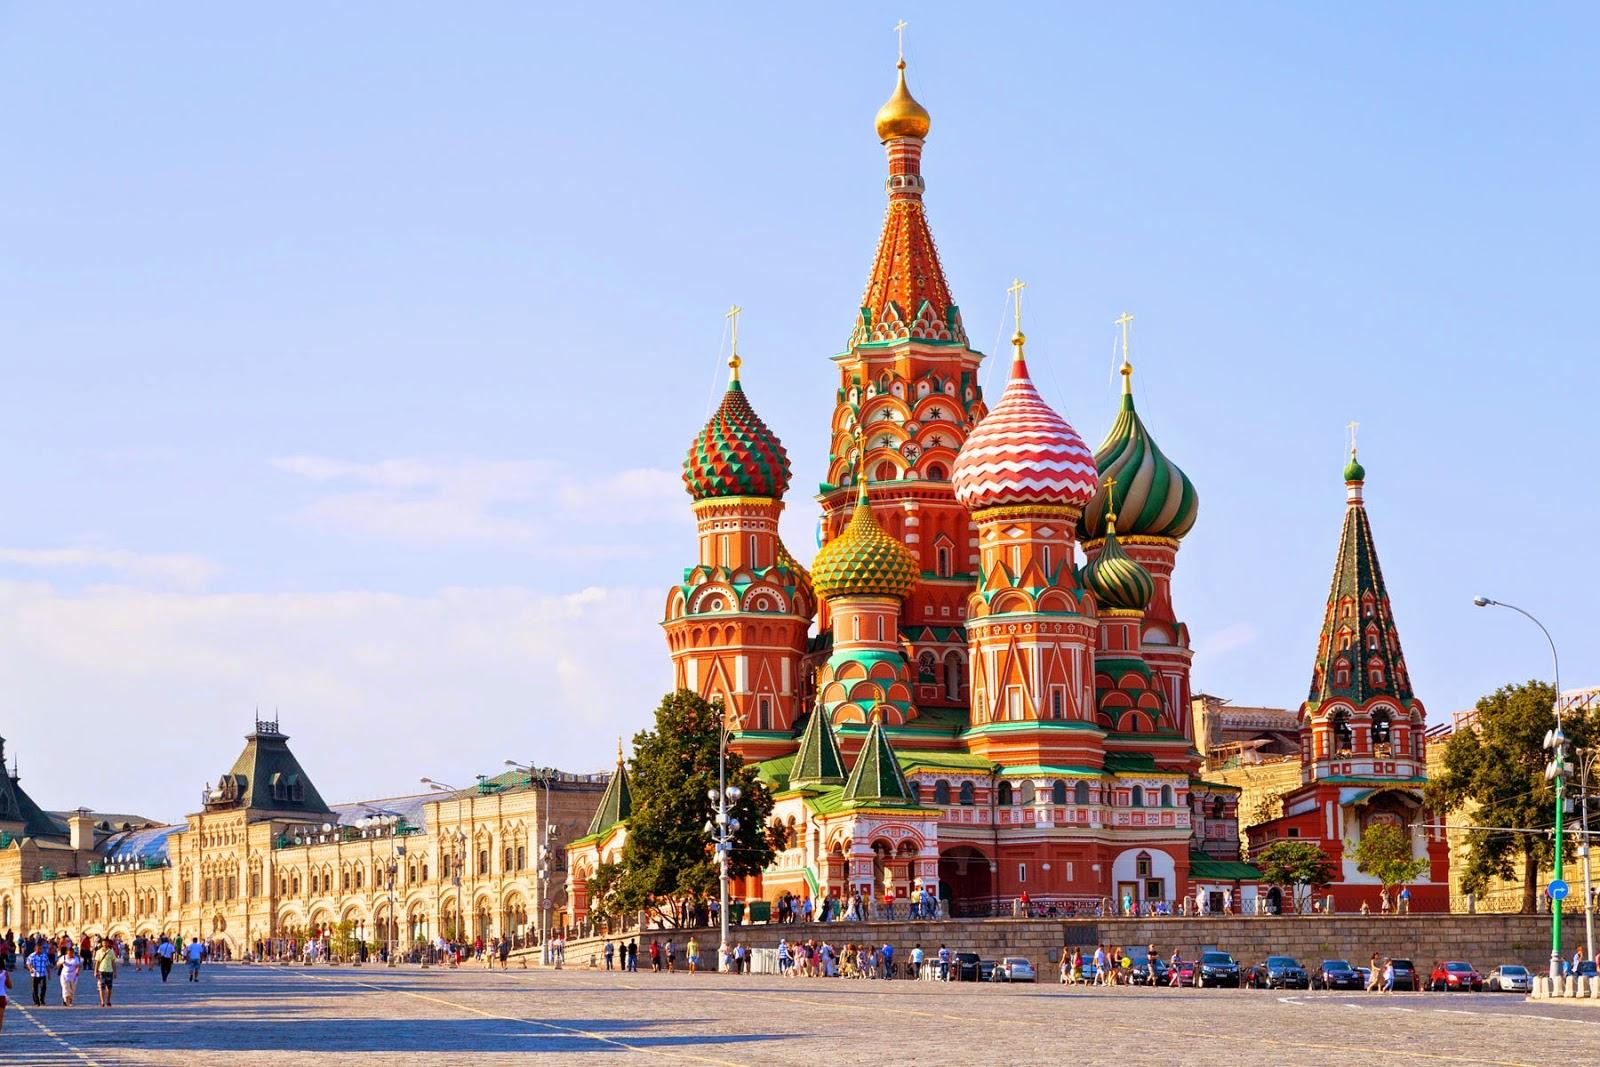 Moscou, place forte échecs mondiaux © Chess & Strategy